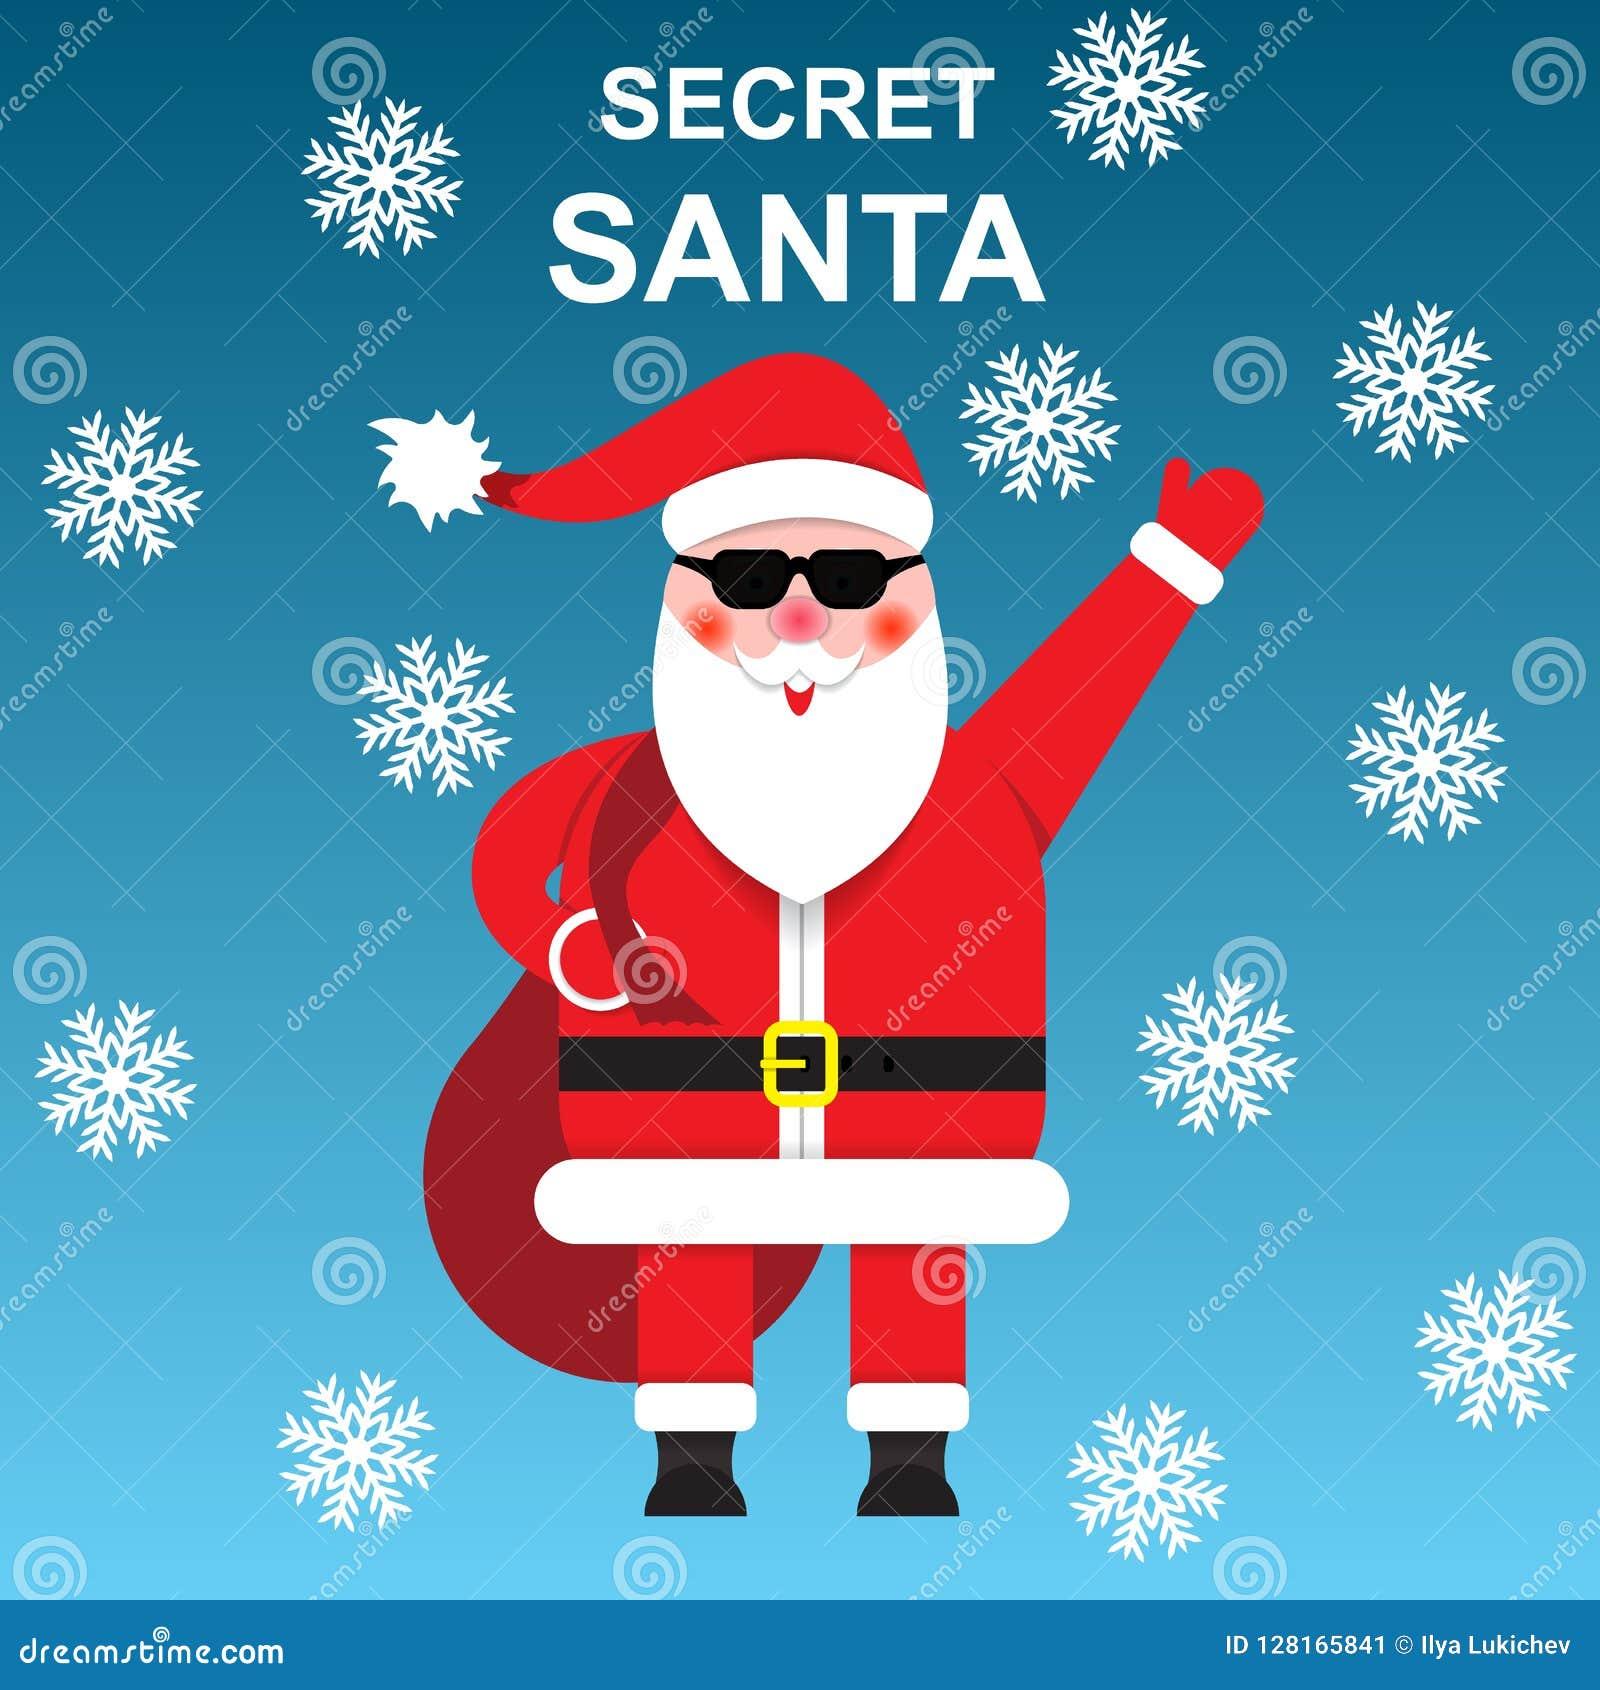 Secret Santa Claus.Secret Gifts. Stock Vector - Illustration of ...